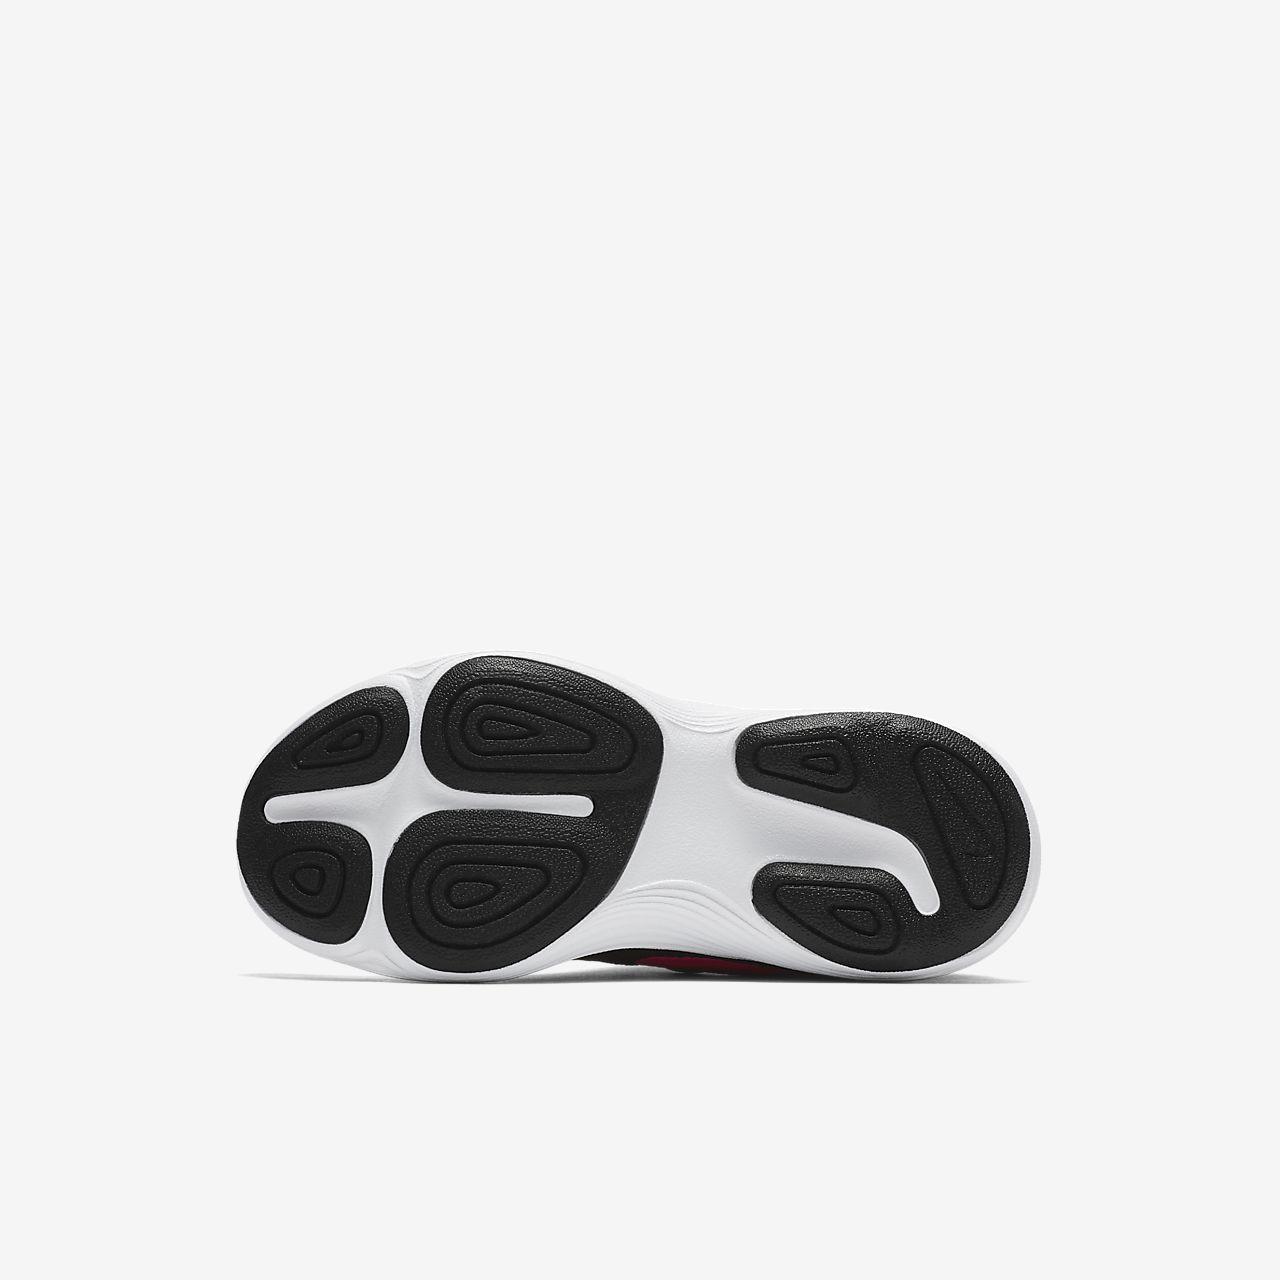 9c71868411ca1 Chaussure Nike Revolution 4 pour Jeune enfant. Nike.com FR